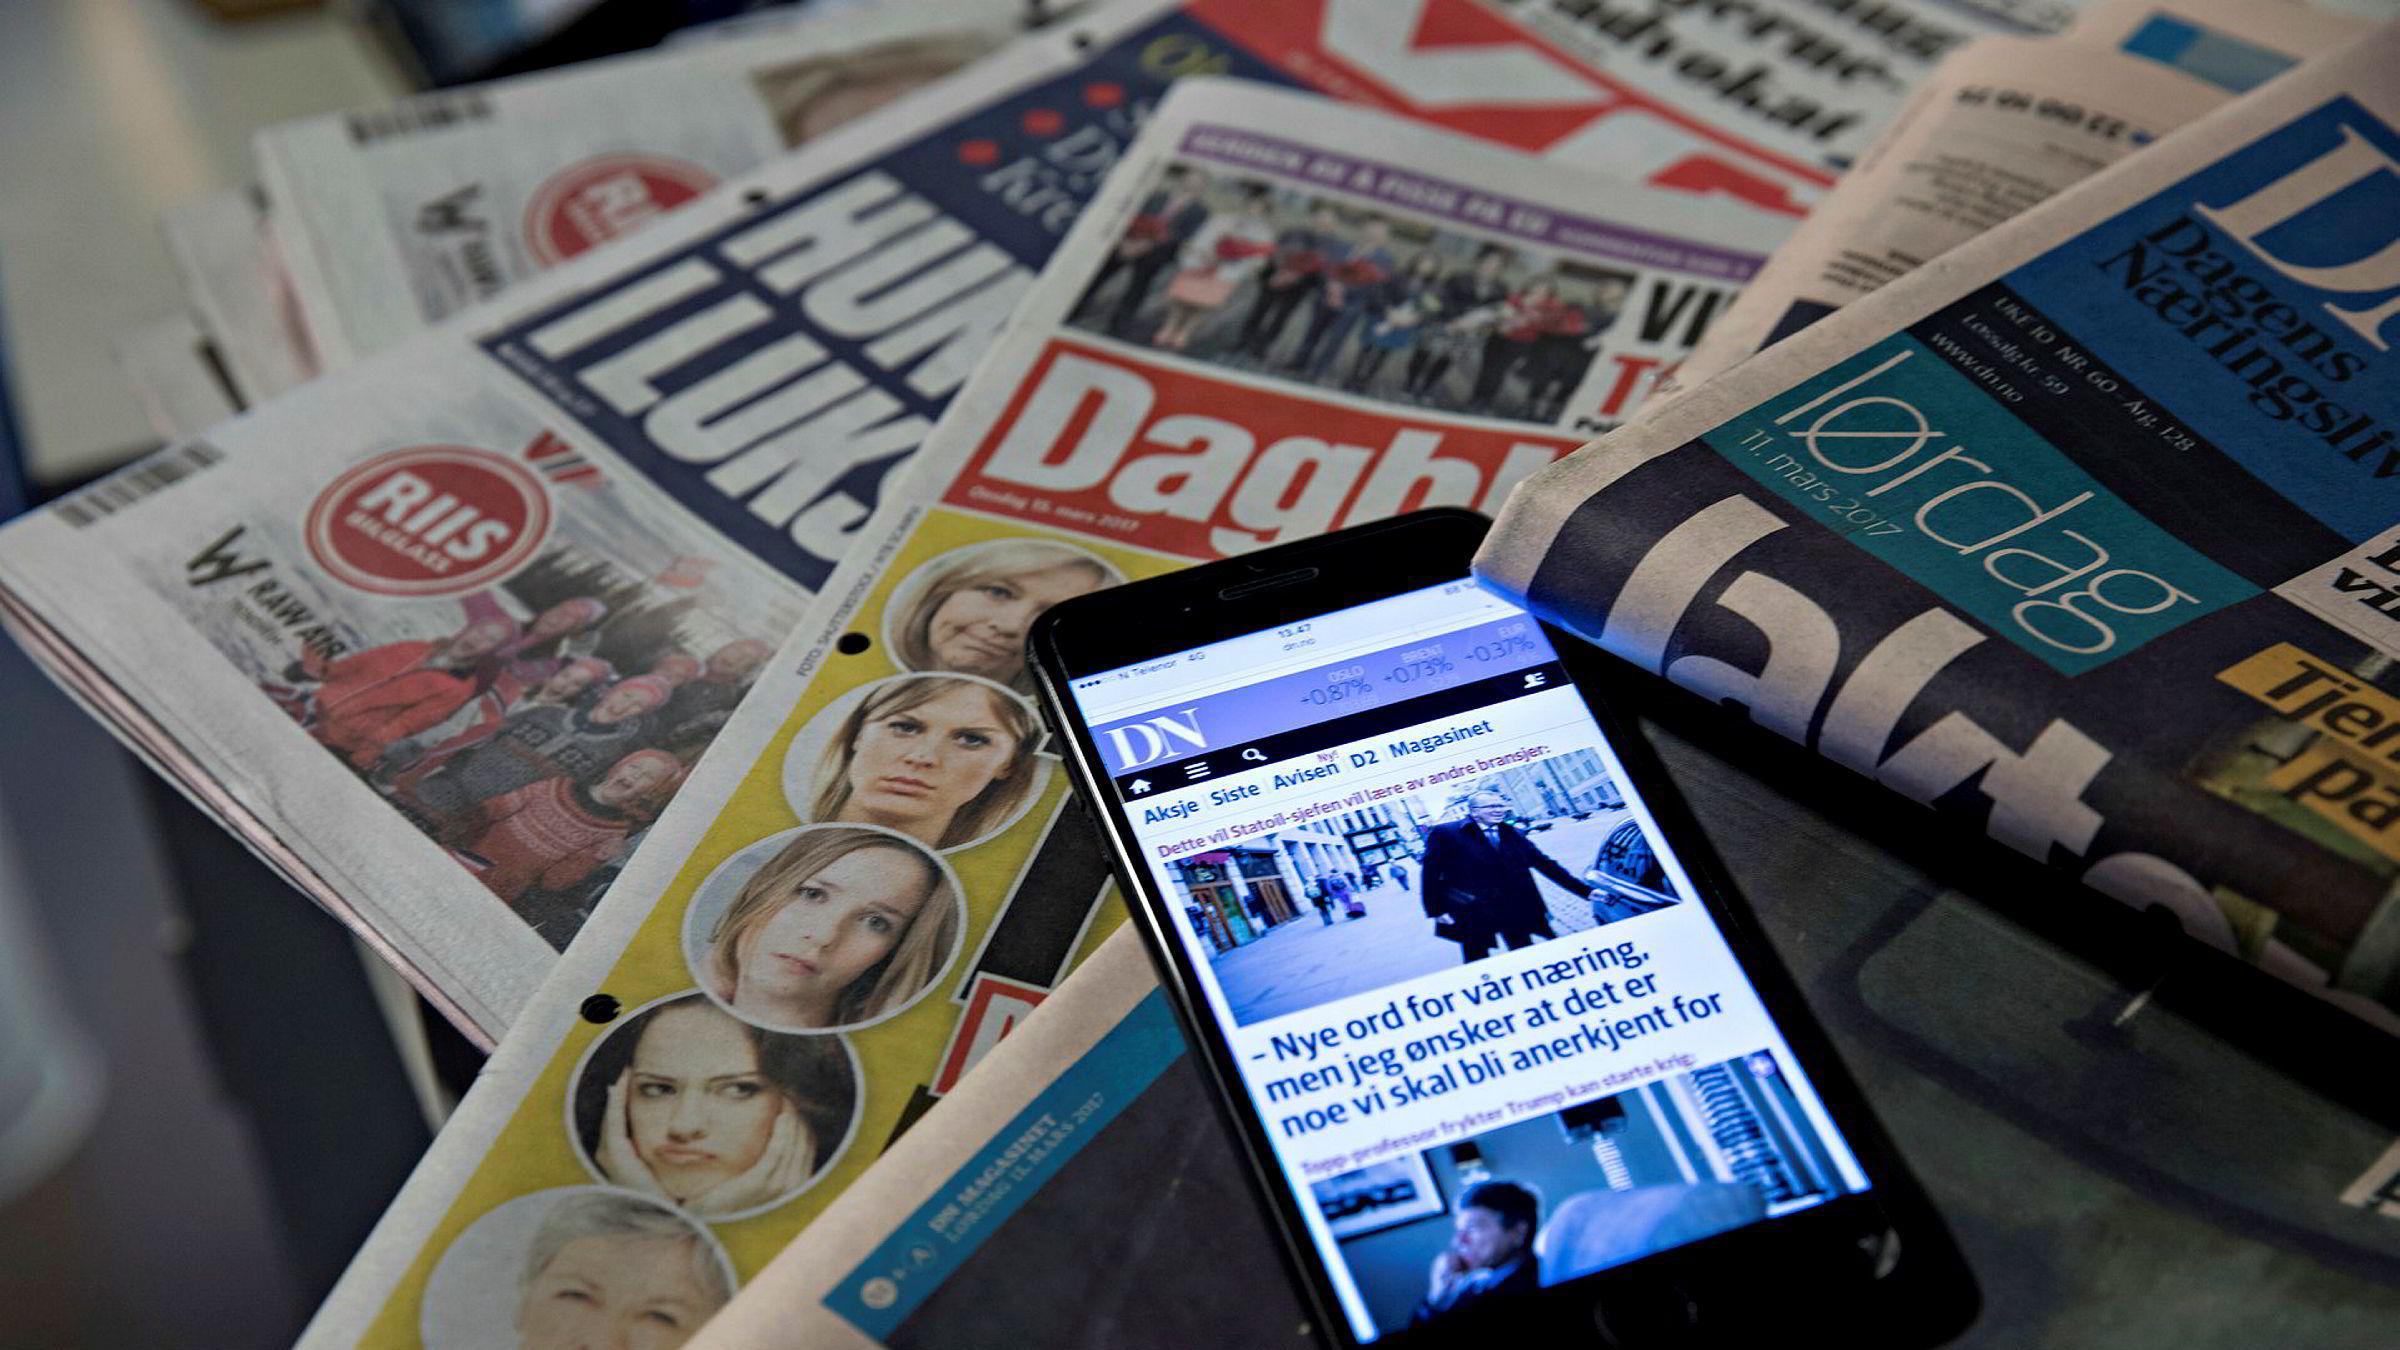 Nordmenn mener norske medier i hovedsak er til å stole på, ifølge ny måling.